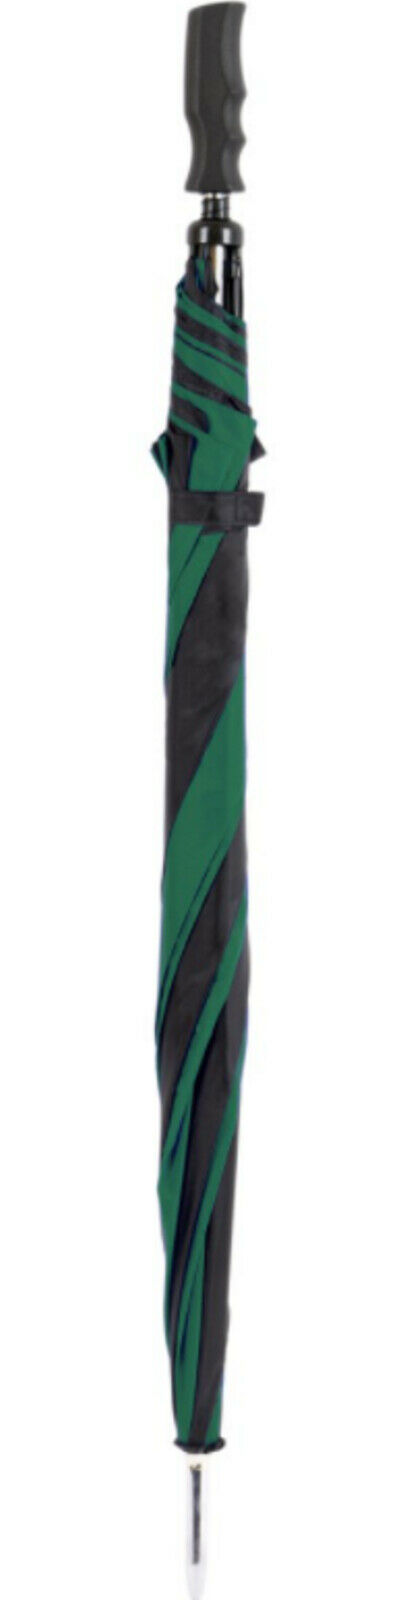 green golf umbrella walking stick